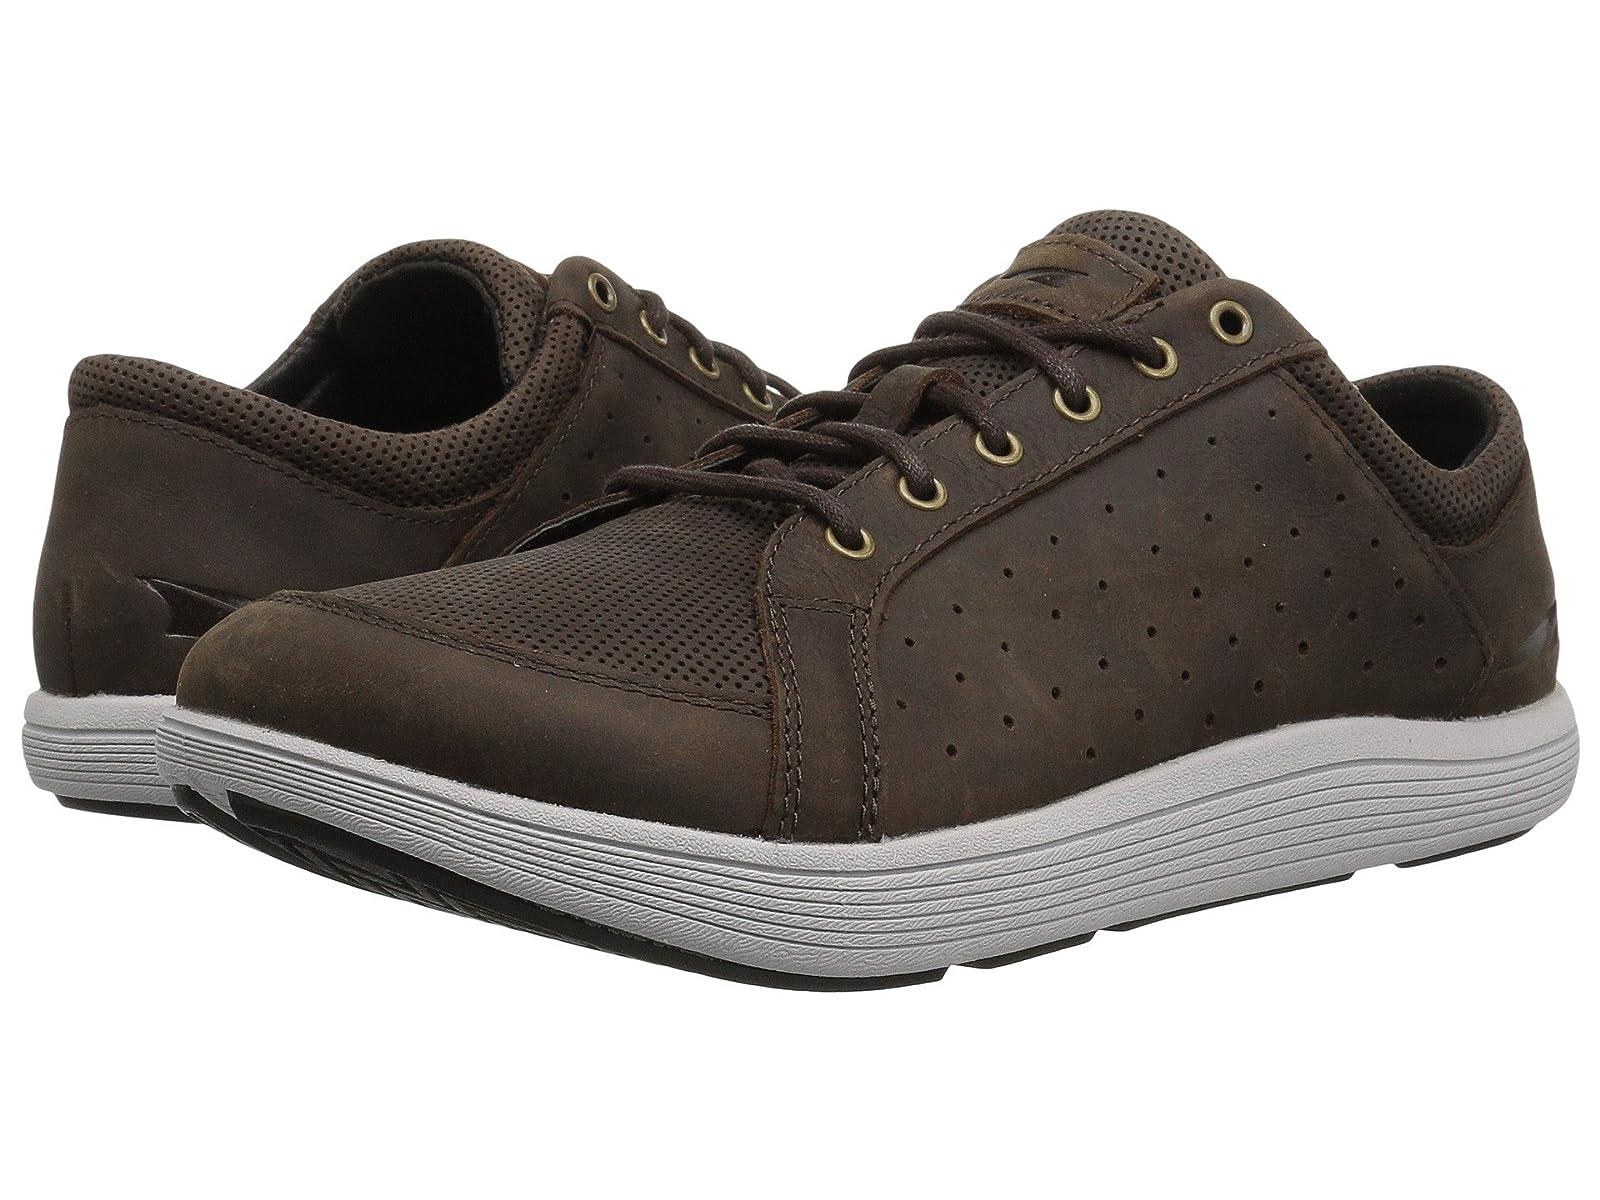 Altra Footwear CaydAtmospheric grades have affordable shoes